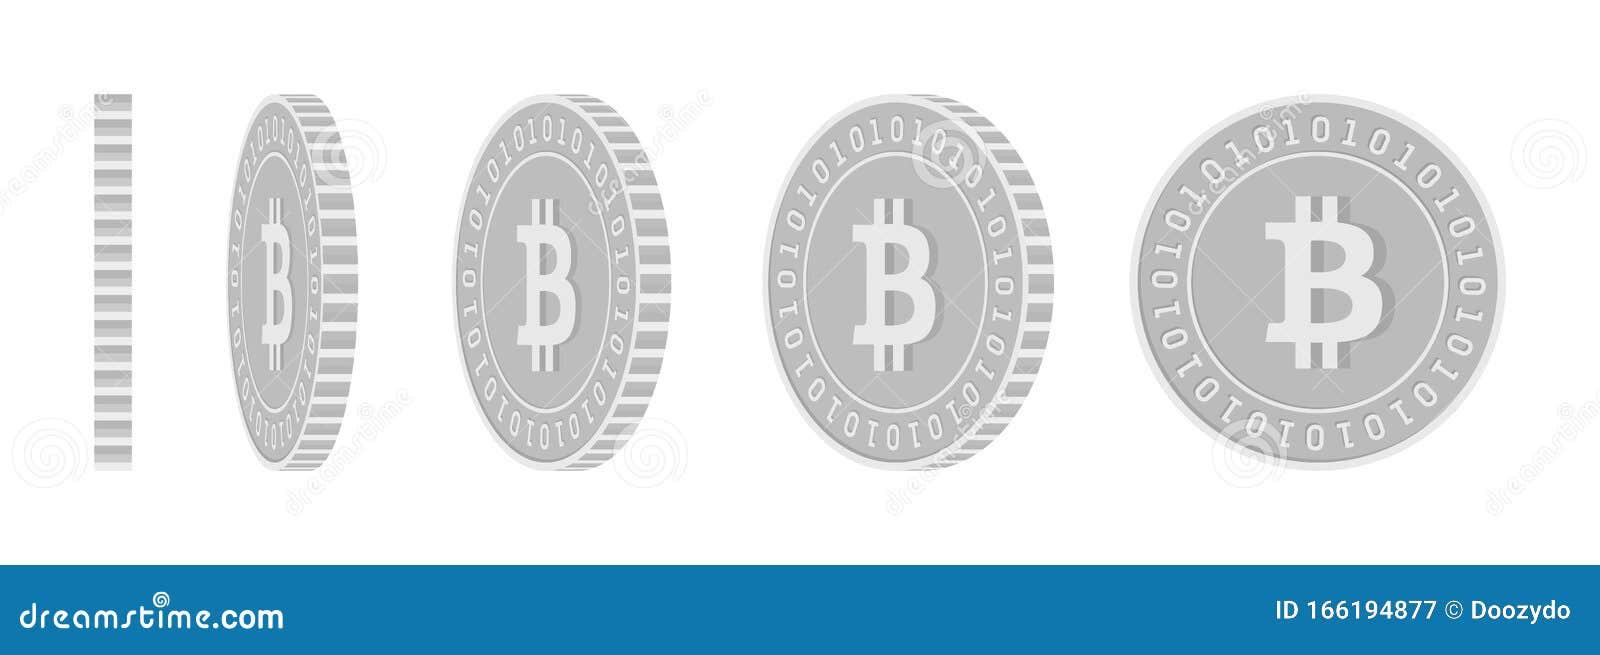 bitcoin internet moneda btc reddit trading